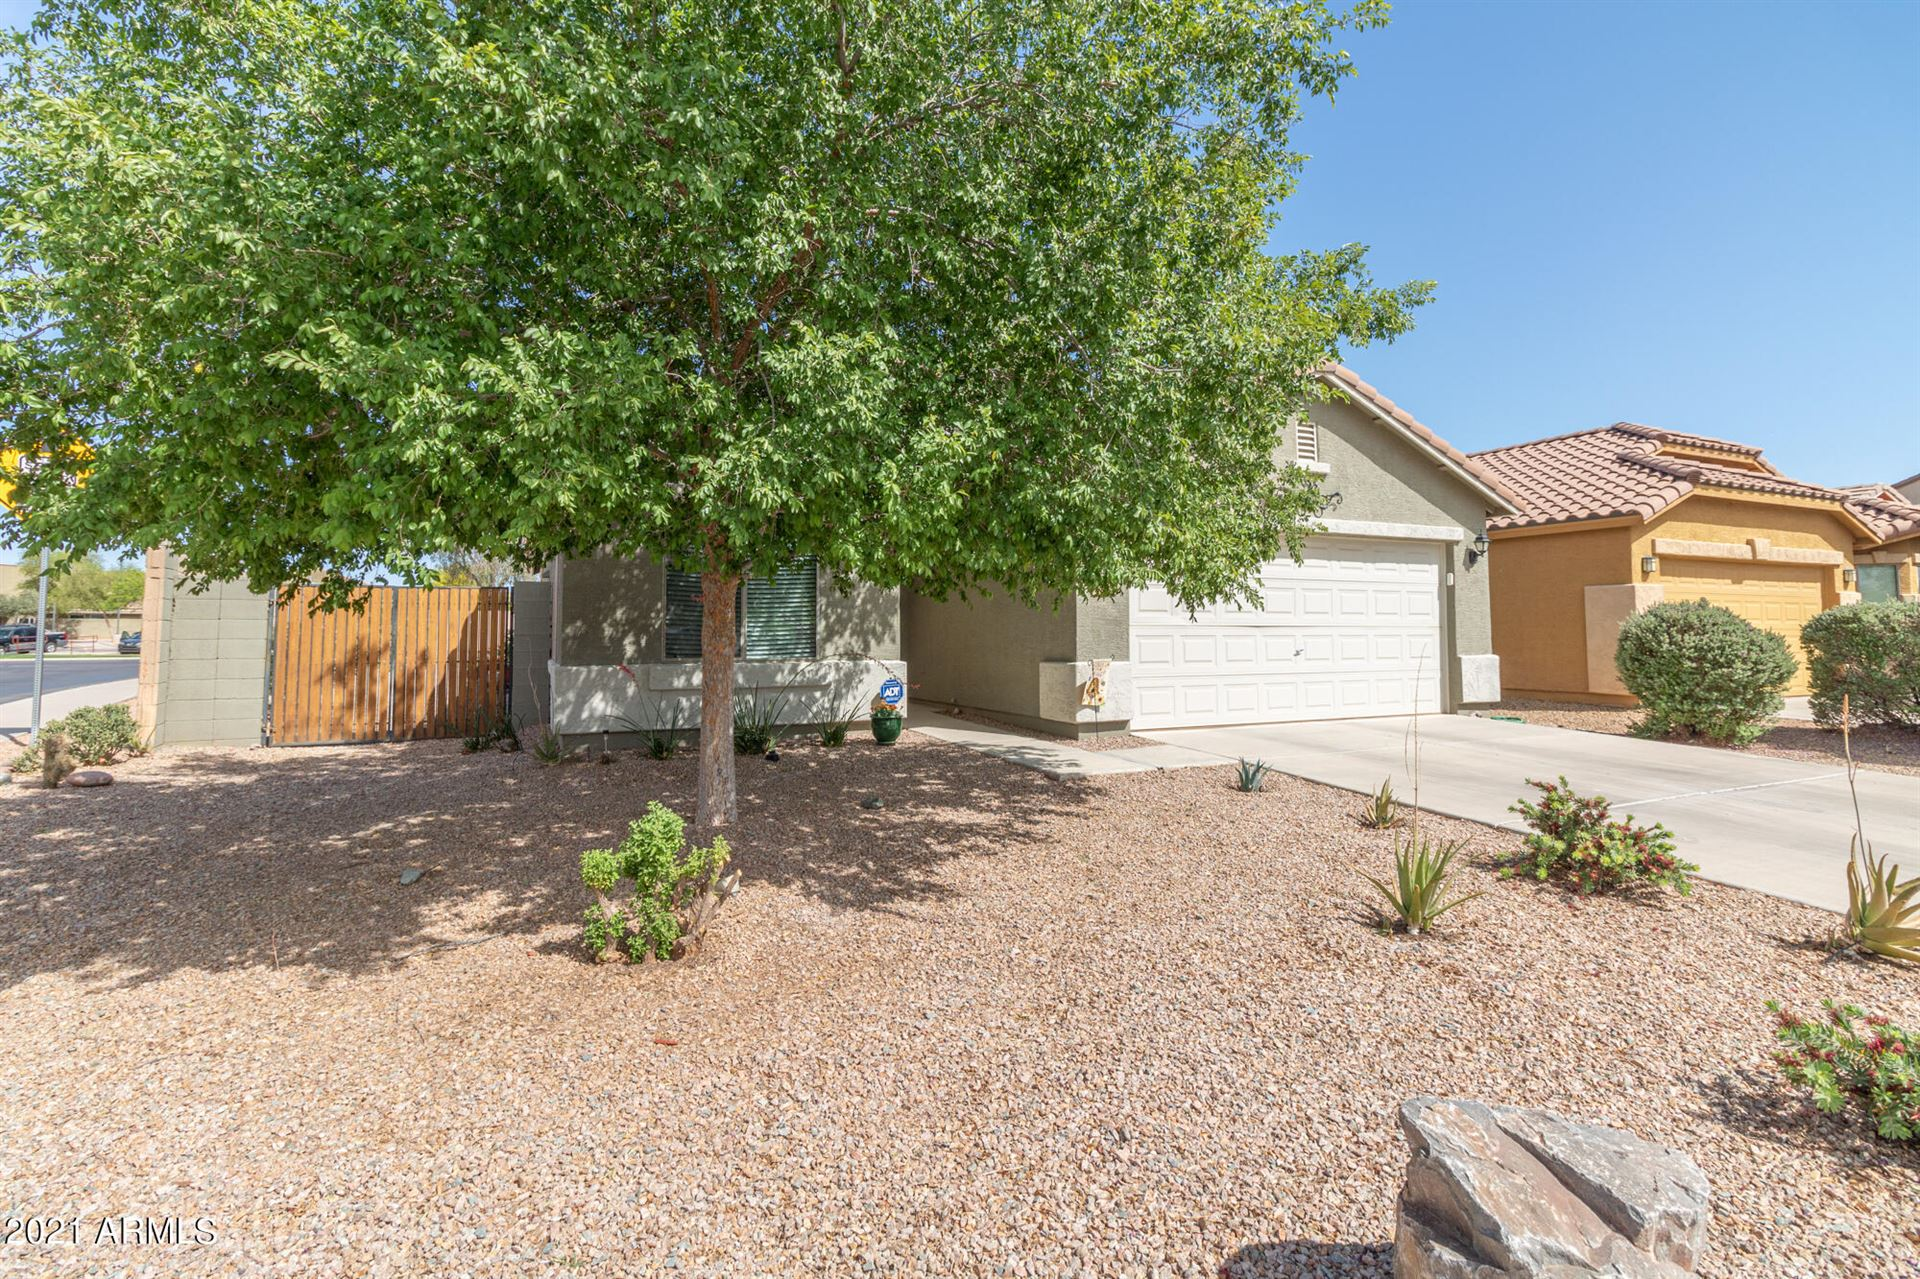 Photo of 19797 N CASTILLE Drive, Maricopa, AZ 85138 (MLS # 6232441)